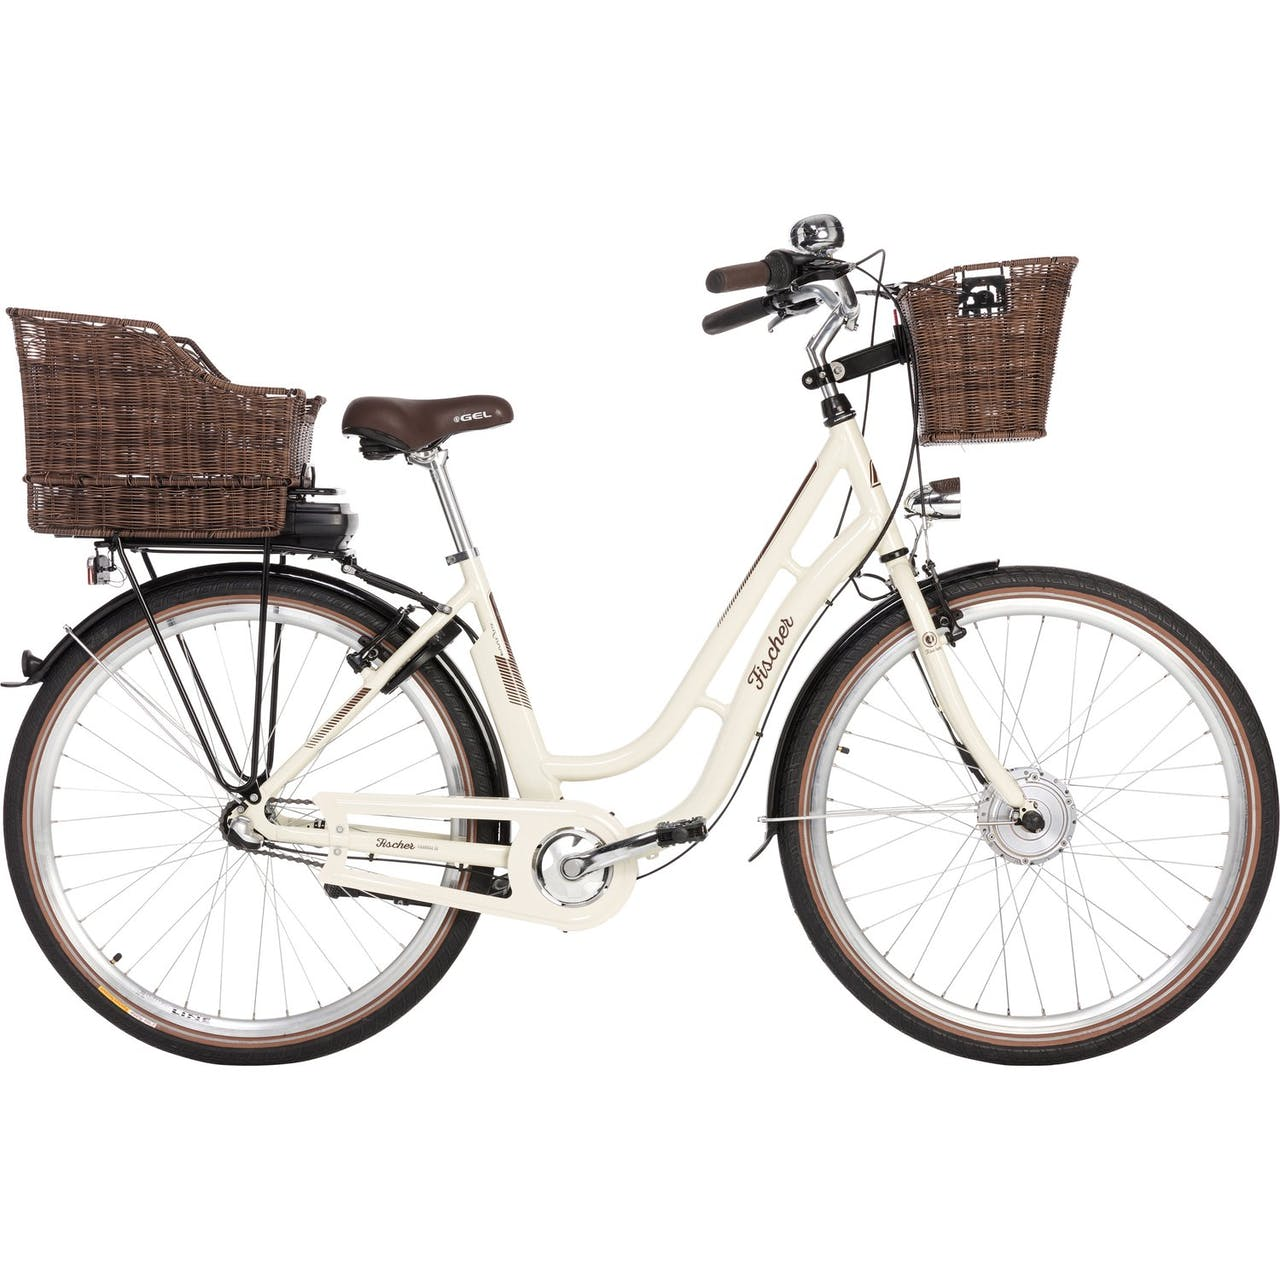 "Fischer E-Bike Damen City-Fahrrad 28"" Retro ER 1804-S1"